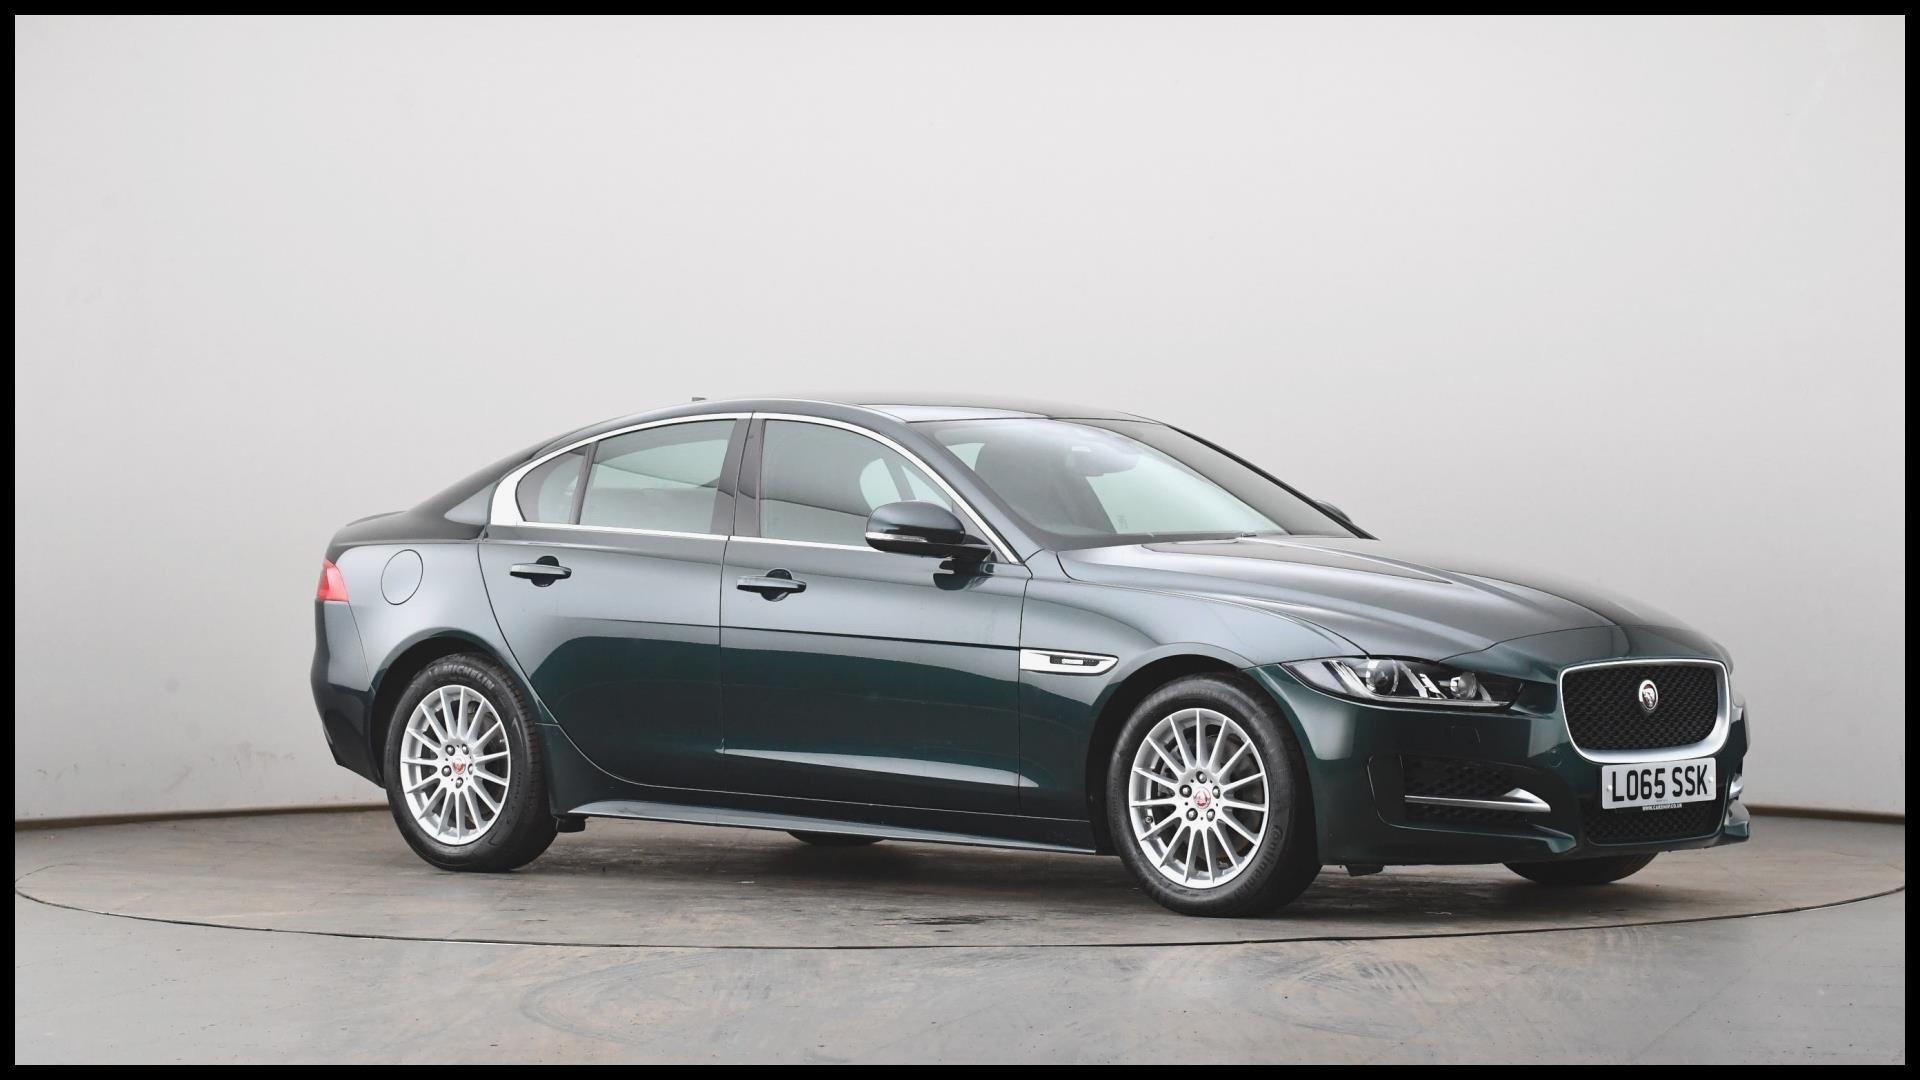 Bmw Manhattan Ny New Used Car Dealerships Ny Unique Bmw Dealer Manhattan Ny – Ingridblogmode